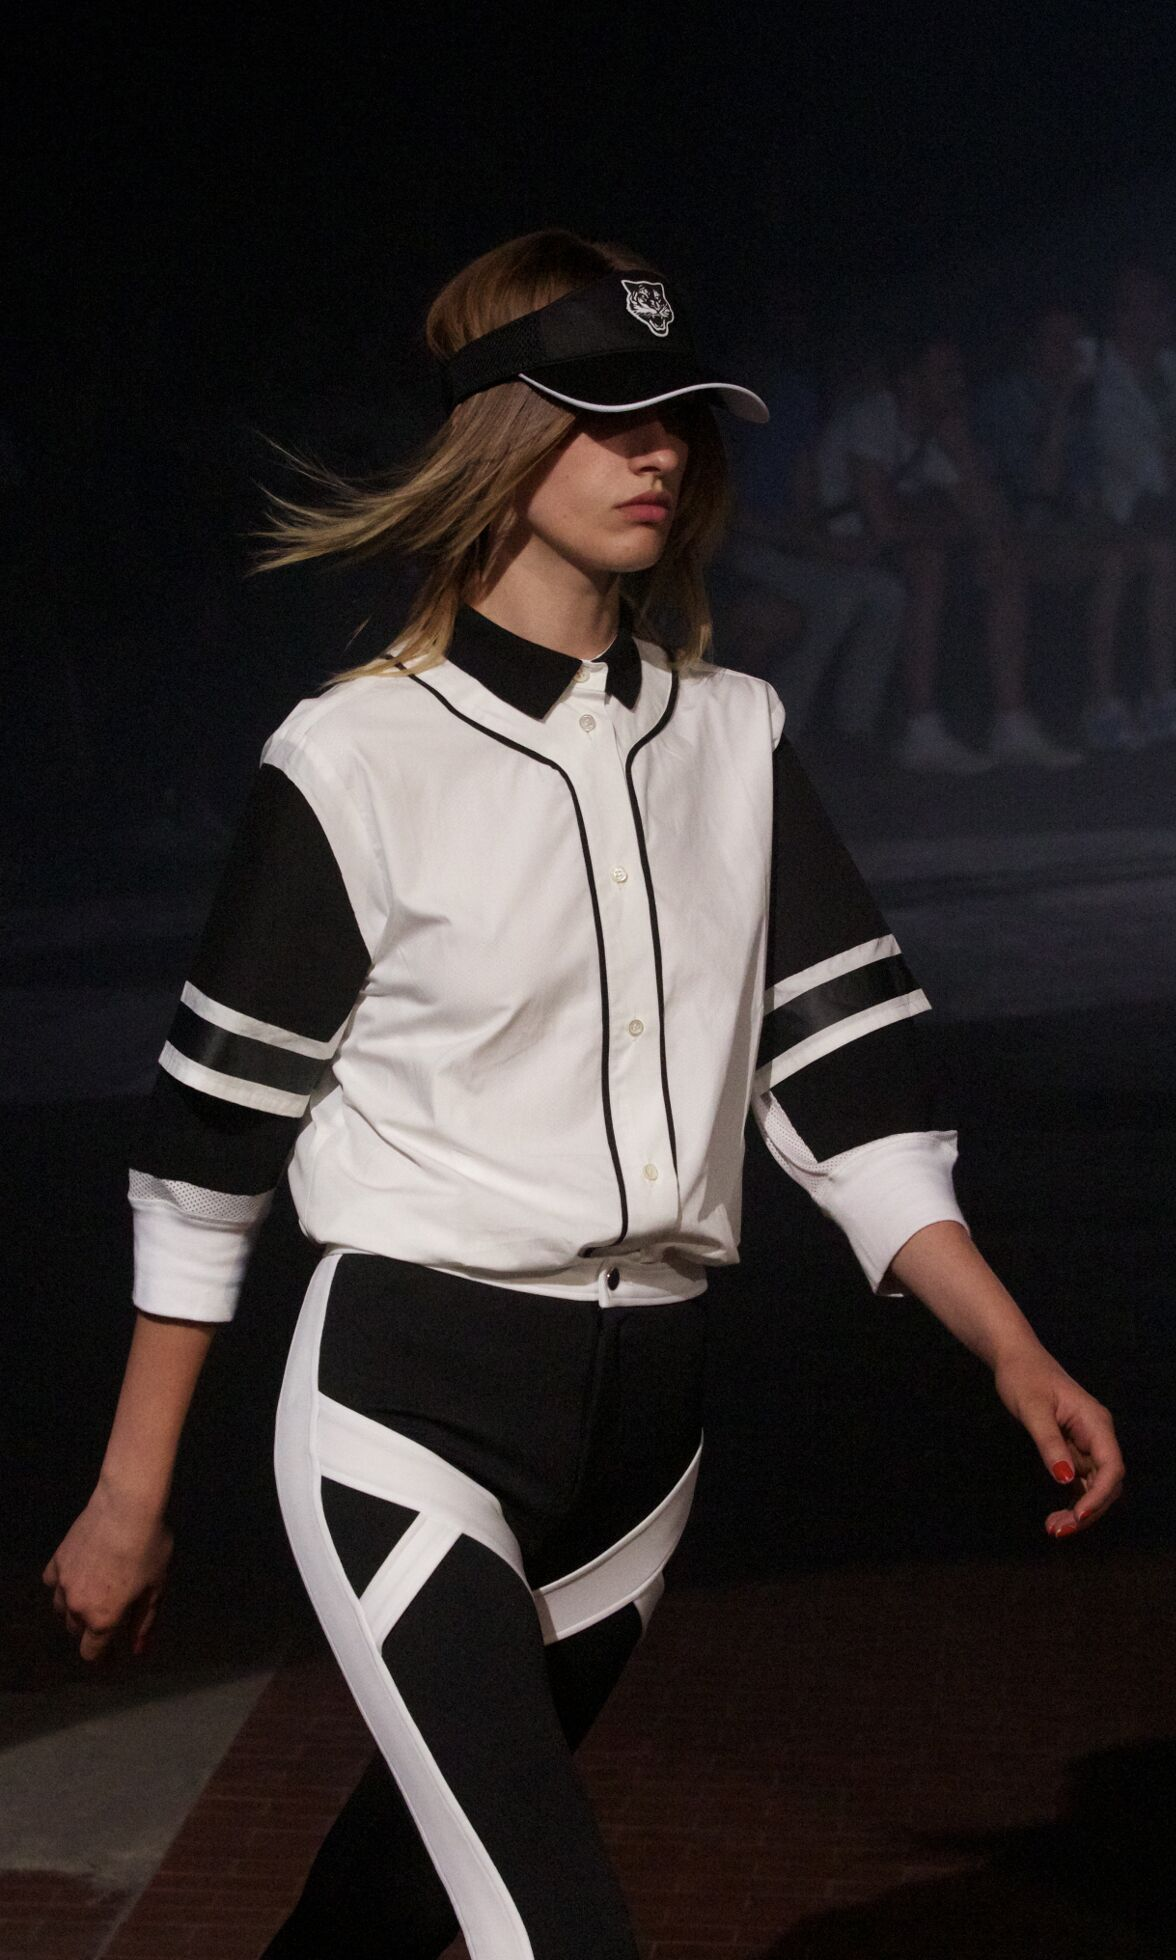 Fashion Model Onitsuka Tiger X Andrea Pompilio